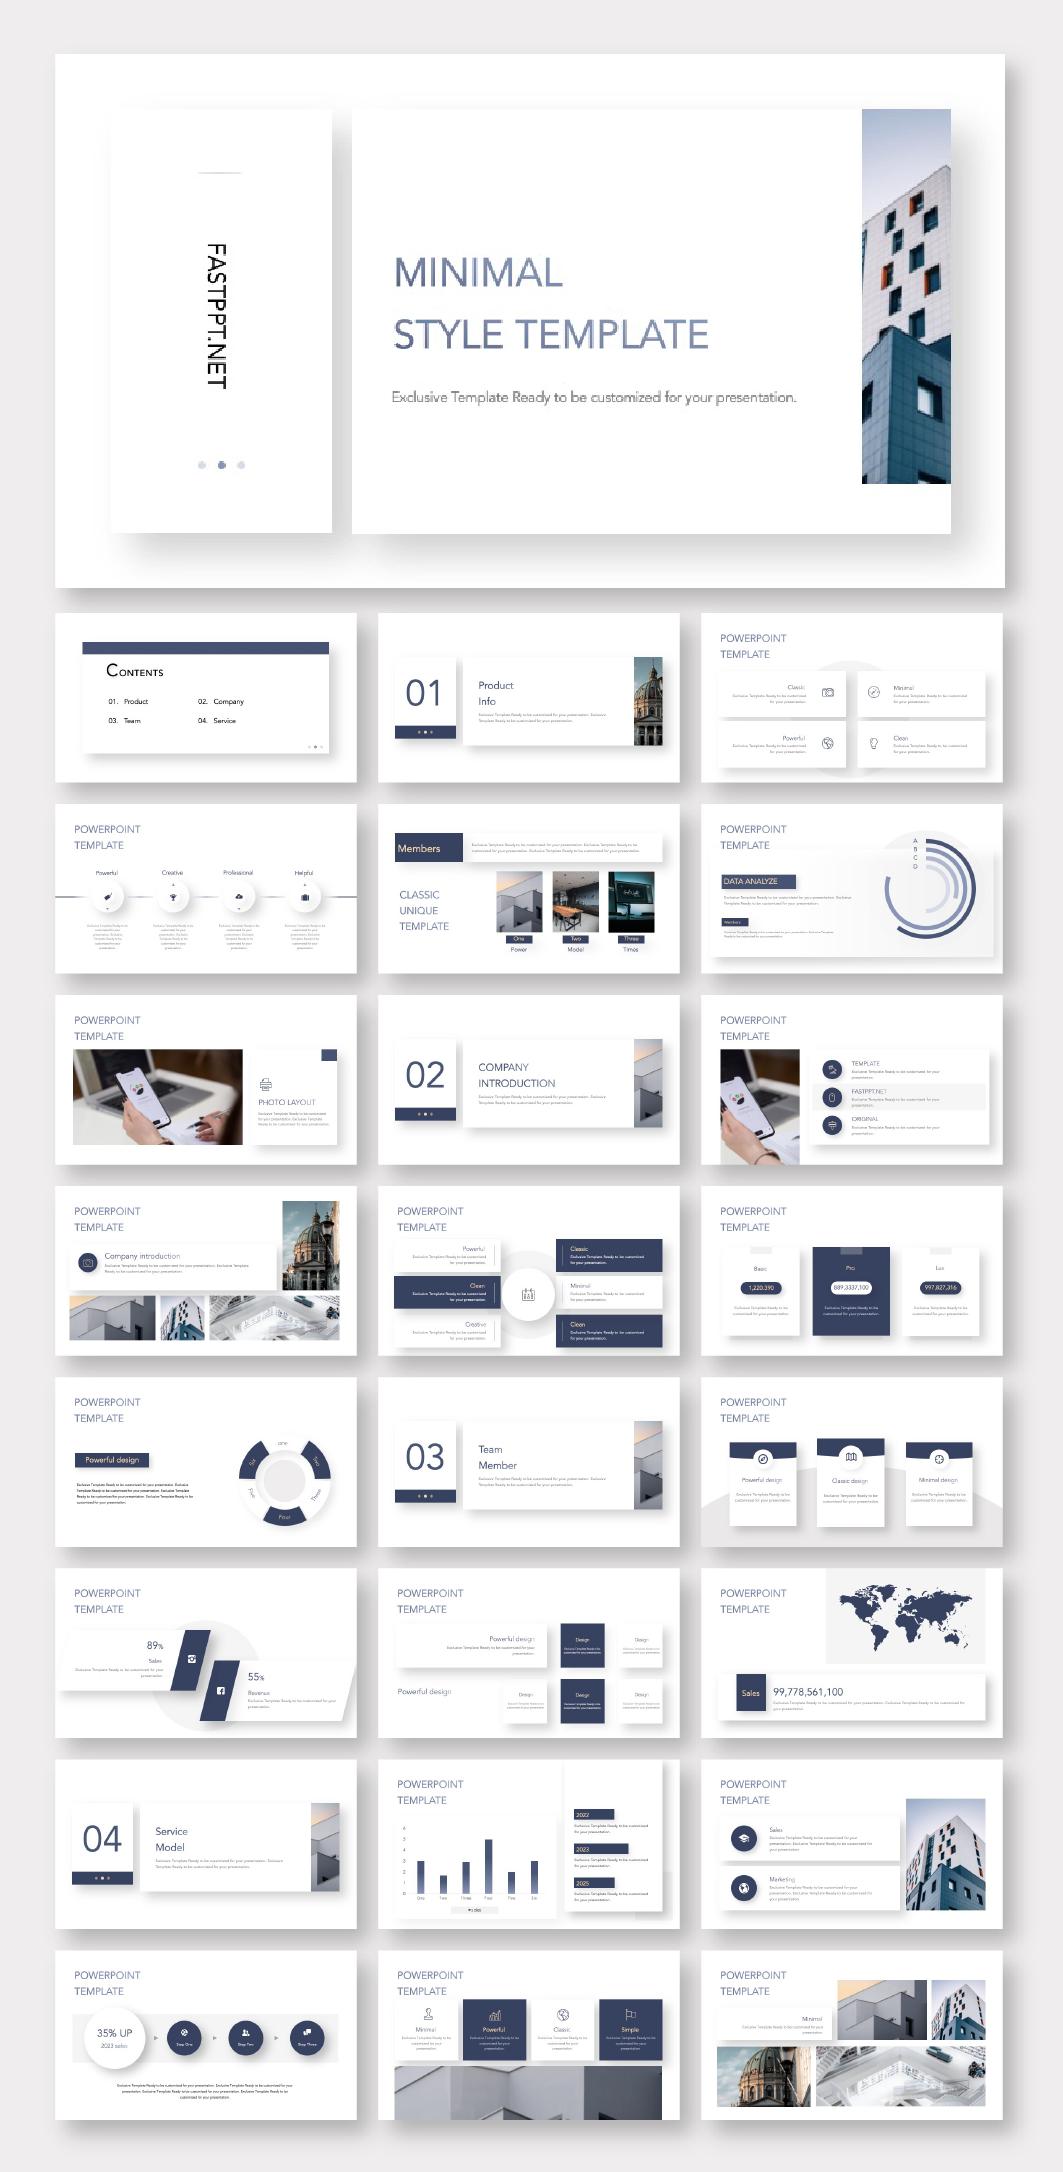 Portal Modern Powerpoint Template Layout Design Powerpoint Design Presentation Layout